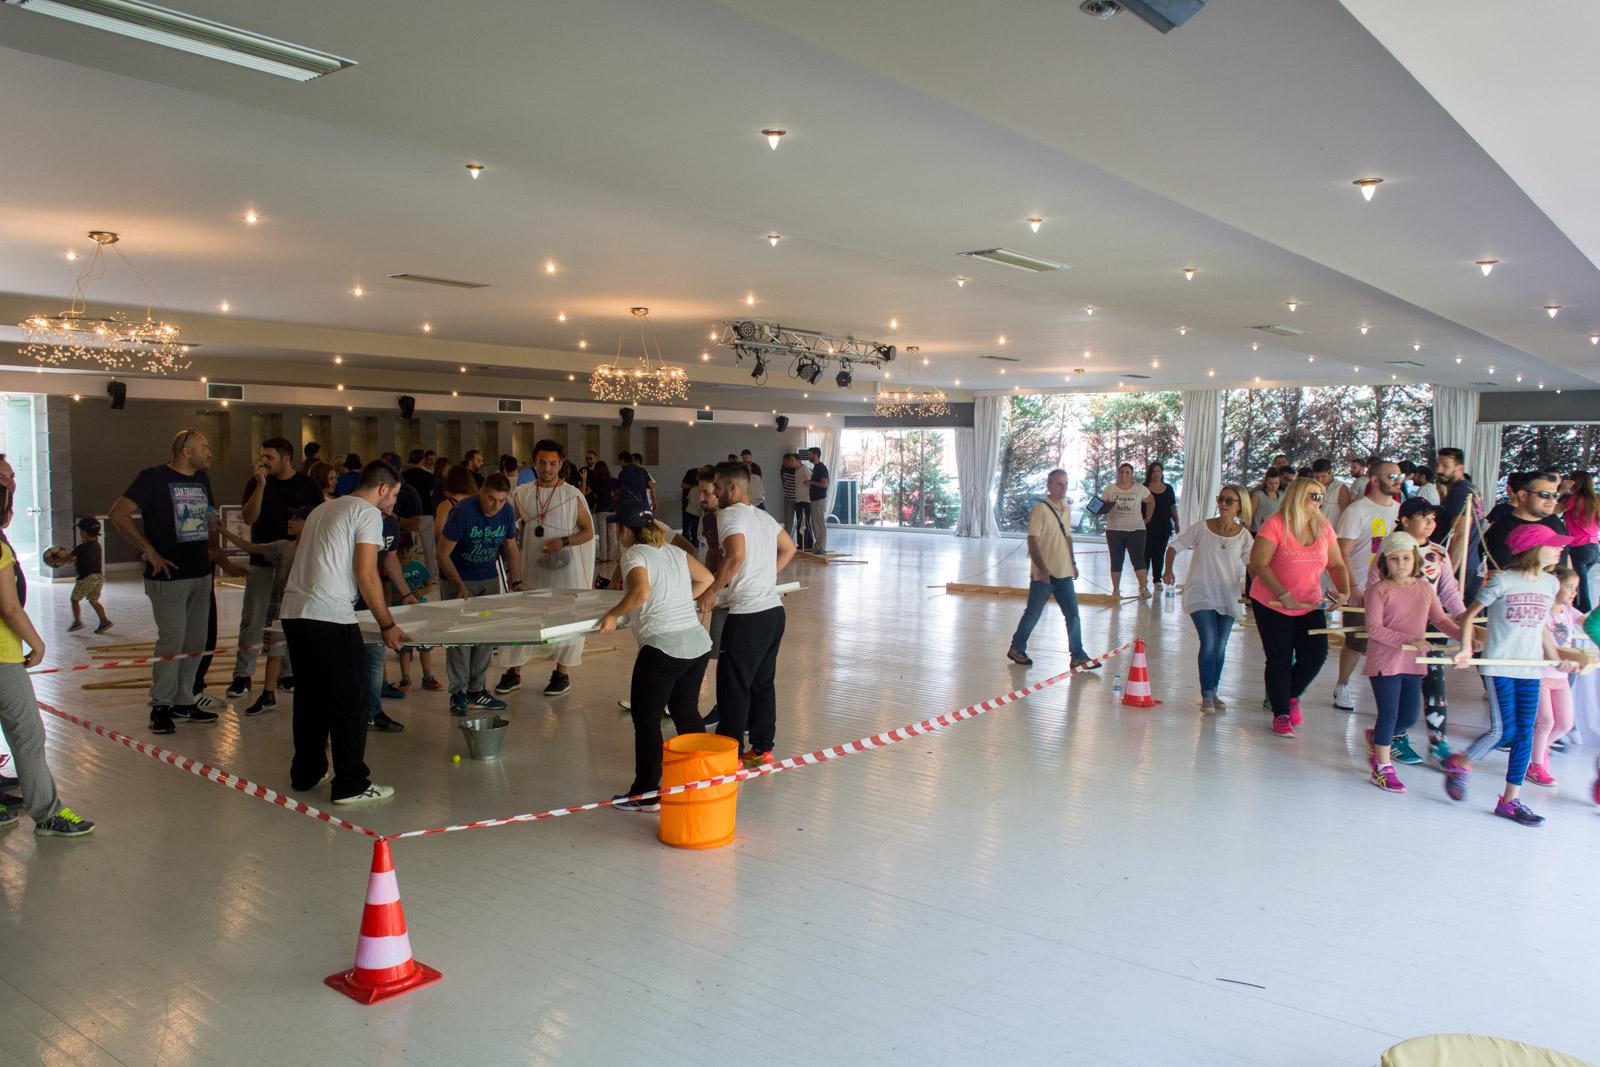 Team building δραστηριότητες για την ενδυνάμωση της ομάδας